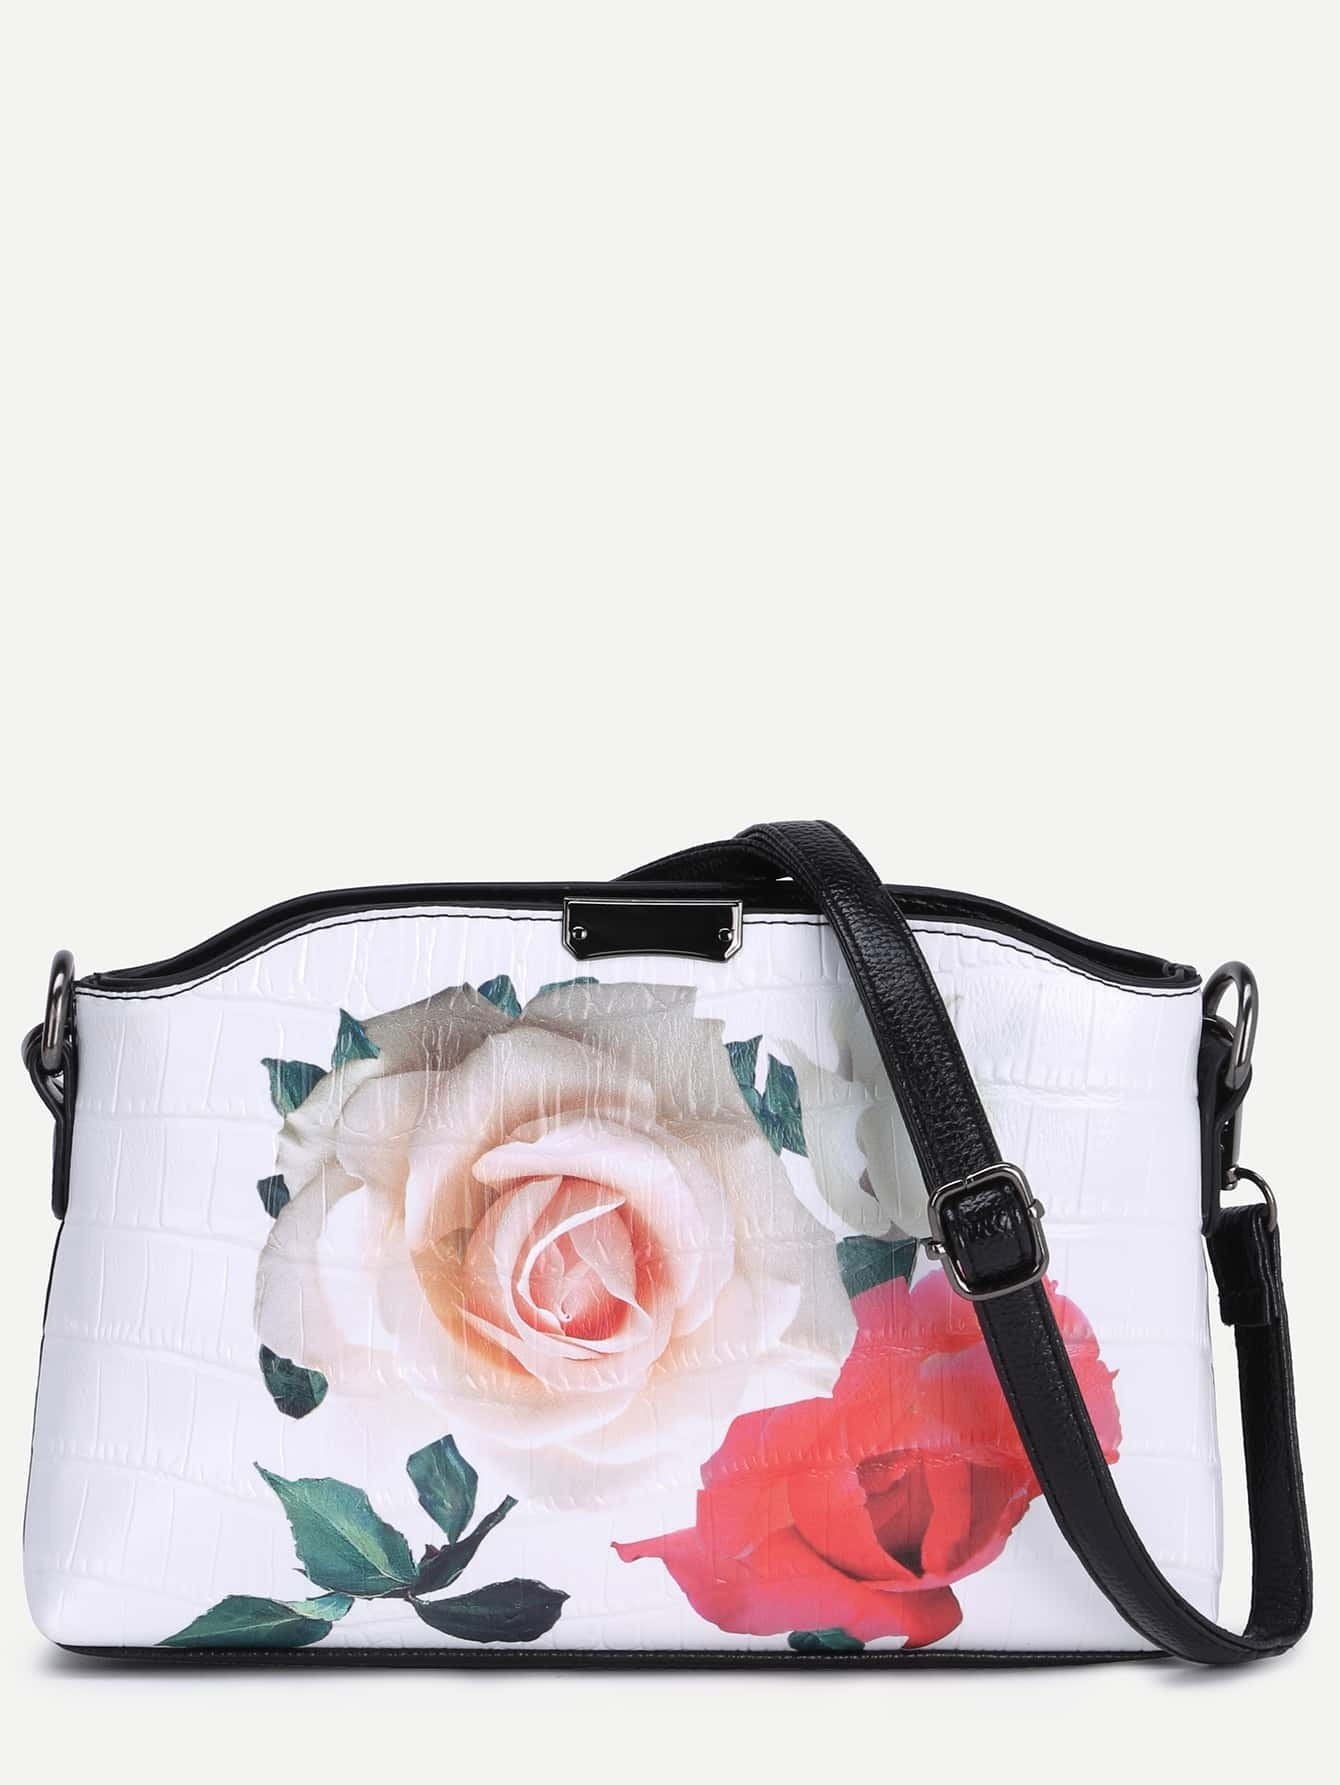 bag160817903_2